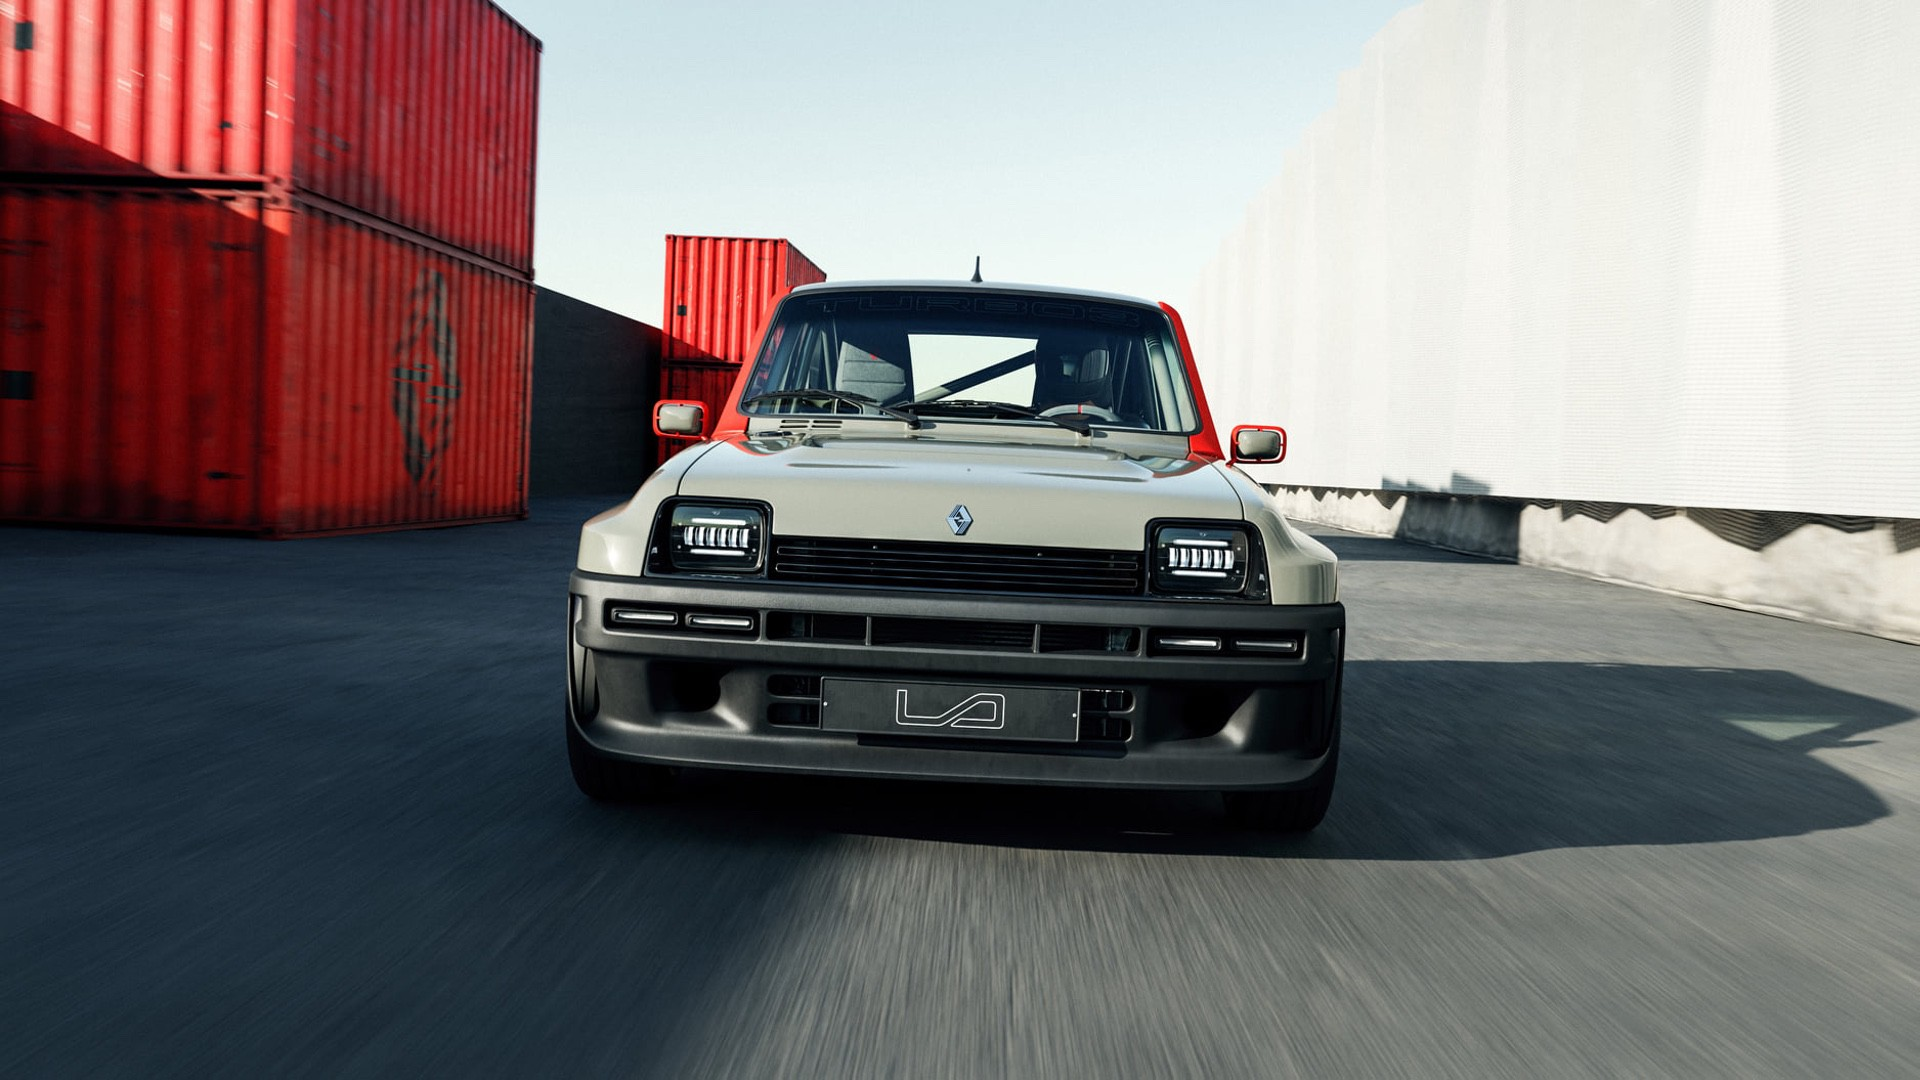 Renault-5_Turbo_3-0007